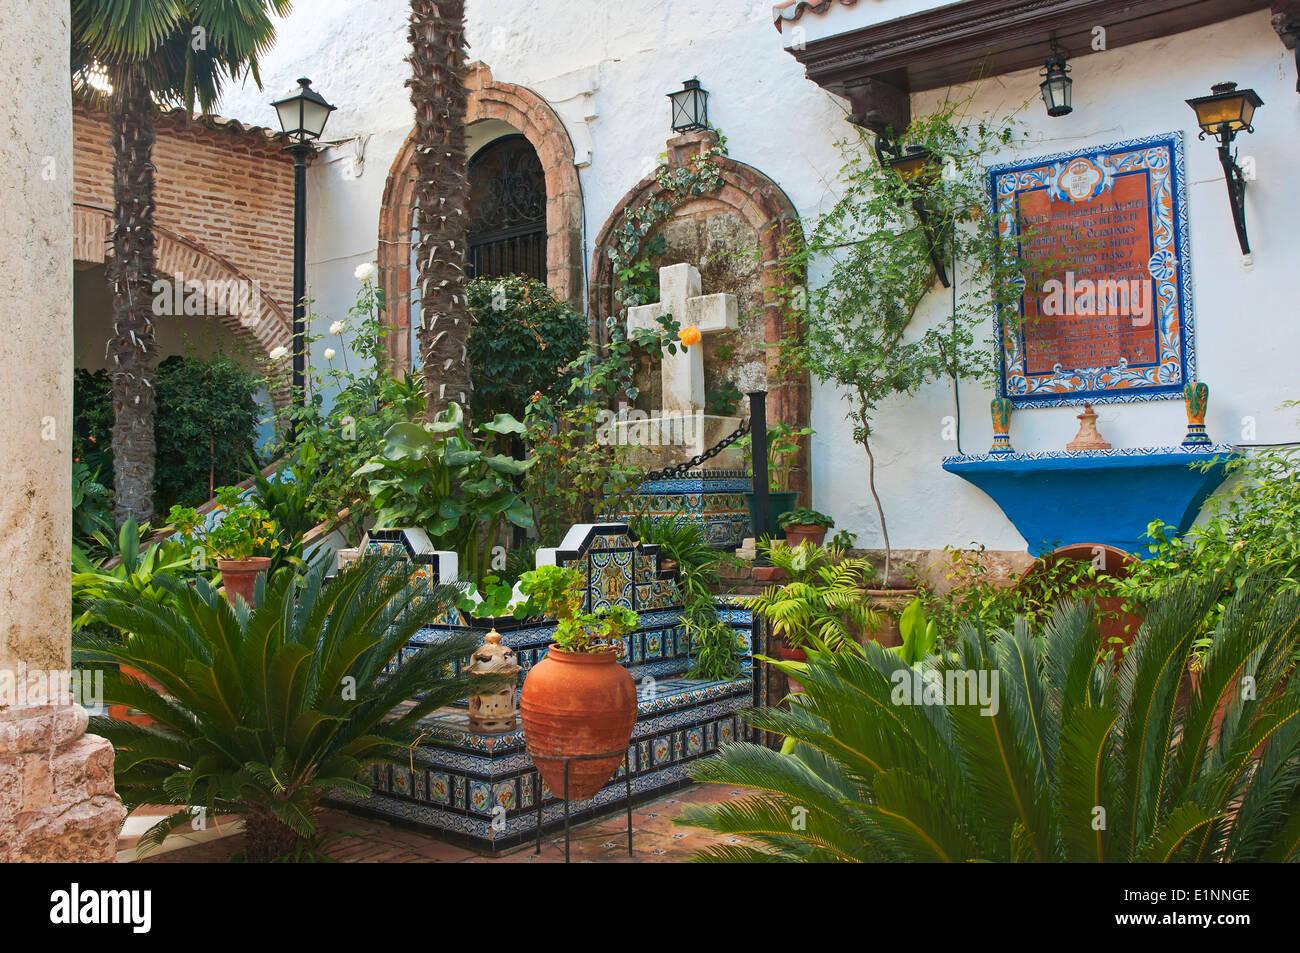 Tomb of Jose Maria 'El Tempranillo', Tourist Route of the Bandits, Inmaculada Concepcion church, Alameda, Malaga province, Andalusia, Spain, Europe - Stock Image